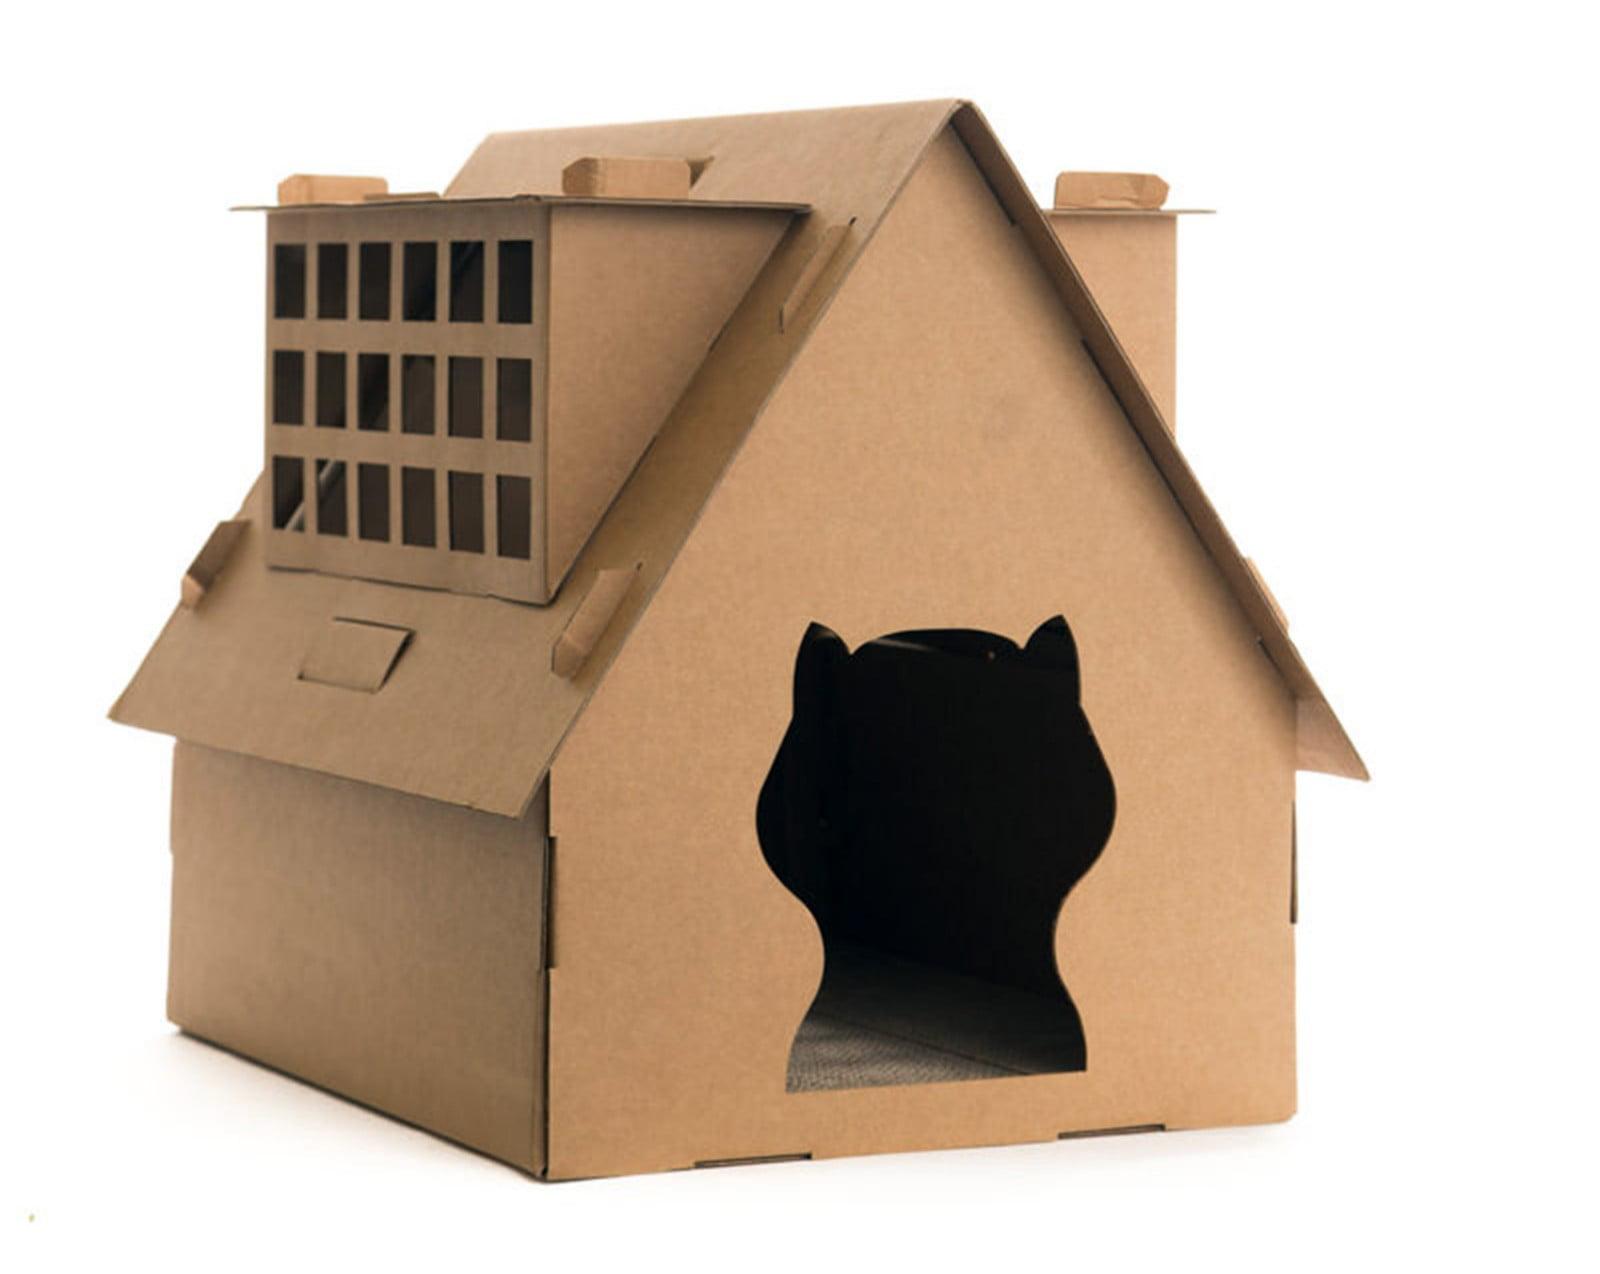 Catopia Diy Cat House For Indoor Cats Toys Cat Corner Scratcher Play Cat Toys Cat Furniture And Scratching Post Walmart Com Walmart Com